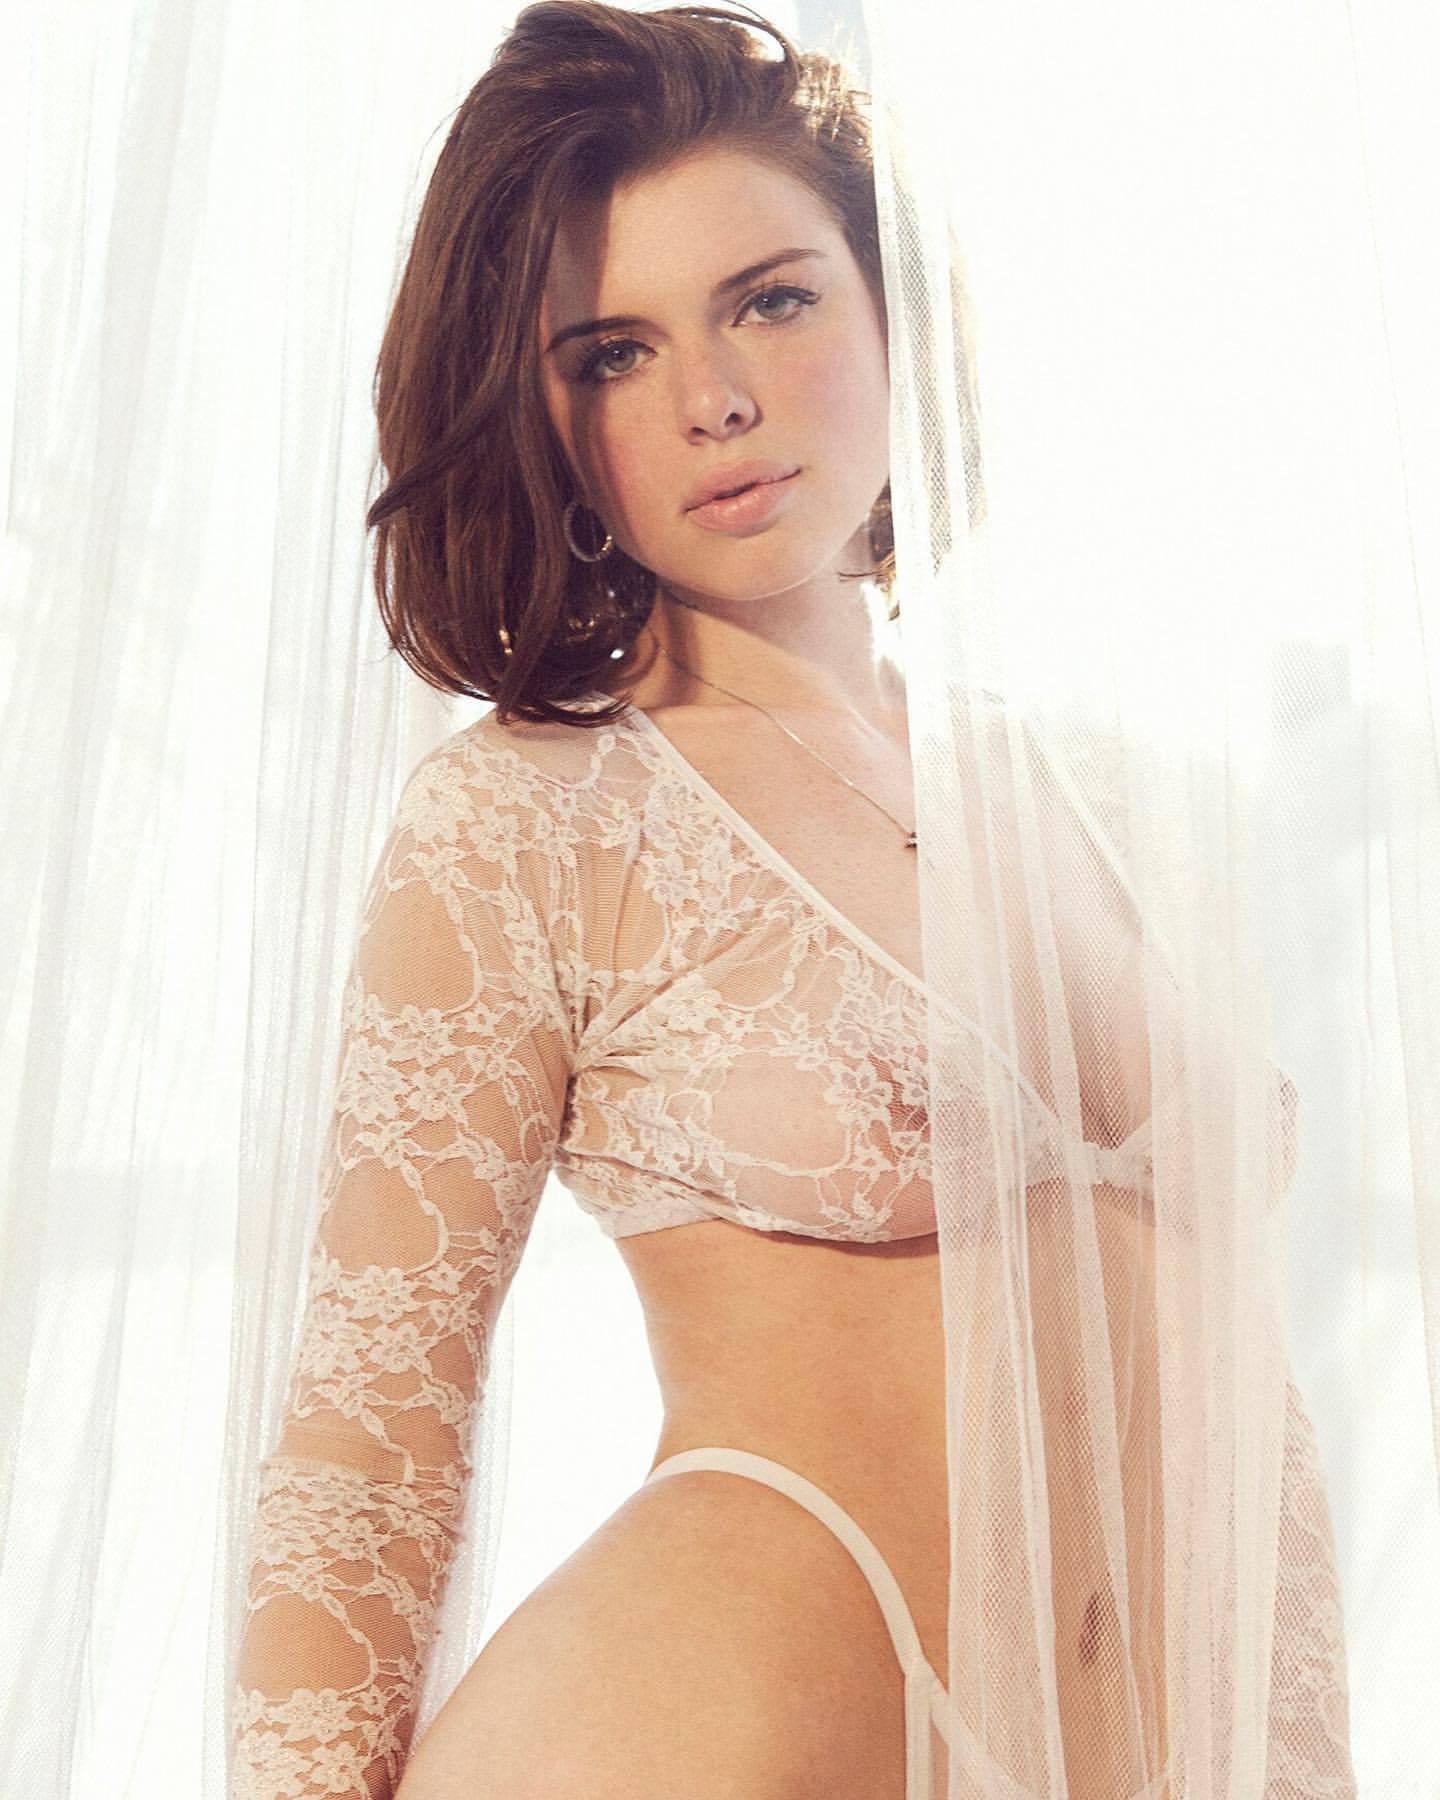 Julia Fox – Beautiful Big Boobs In Sexy Sheer Lingerie 0002